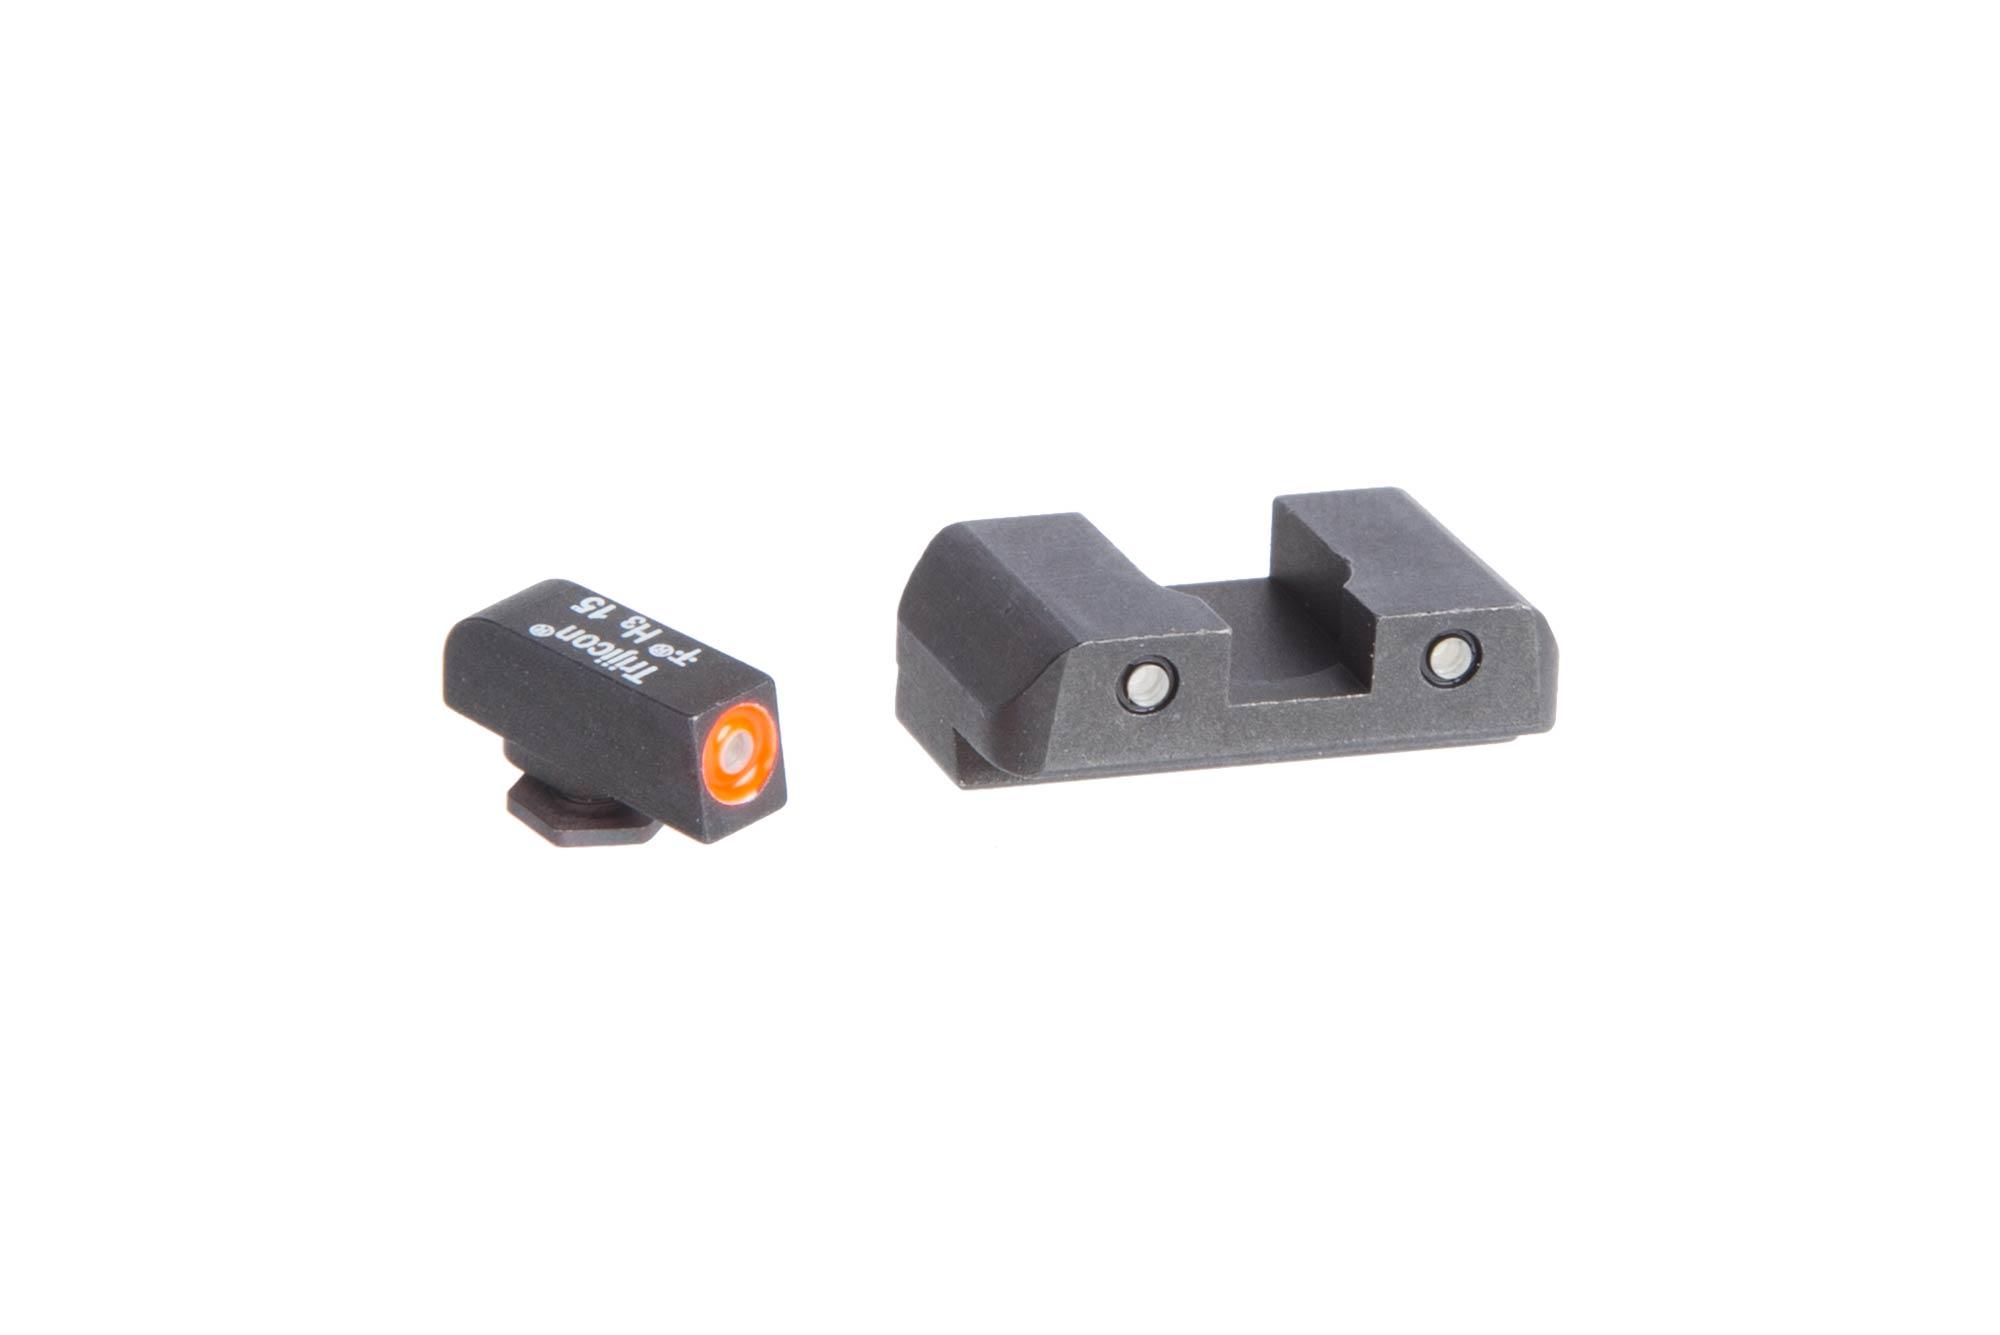 ameriglo spartan series tritium night sights g g glock 17 19 etc